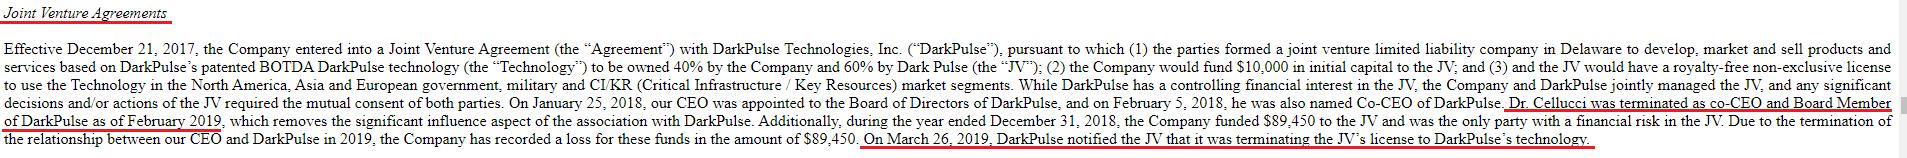 DarkPulse JV Terminate Tom Cellucci